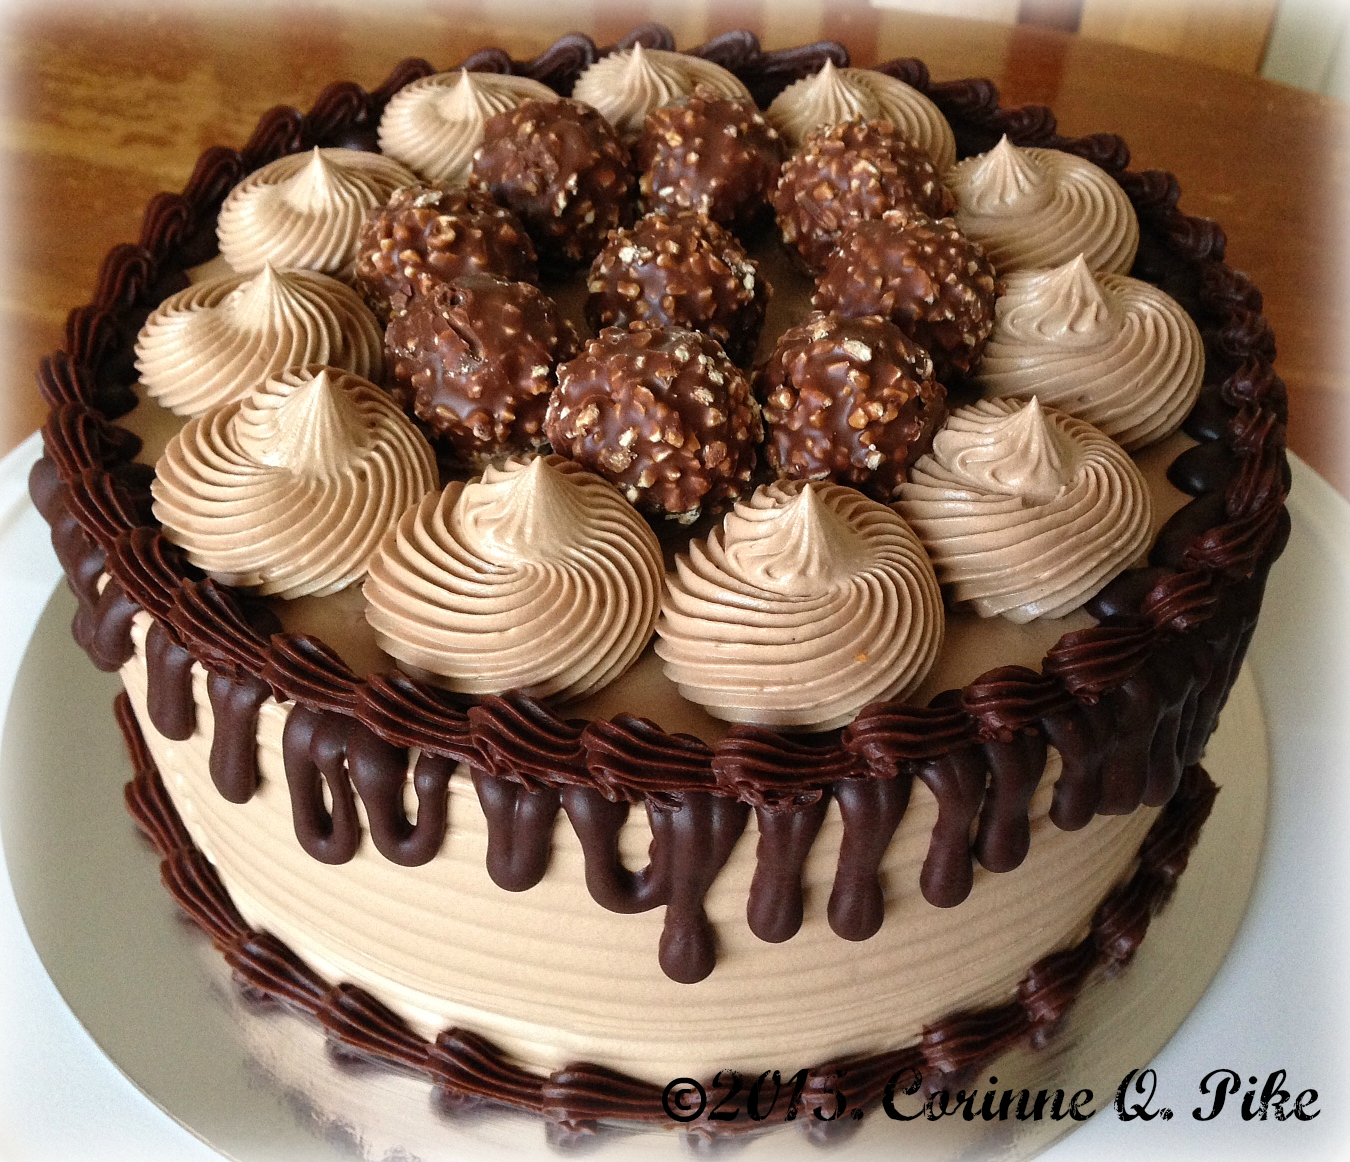 Chocolate Ferrero Rocher Cake With Nutella Ganache